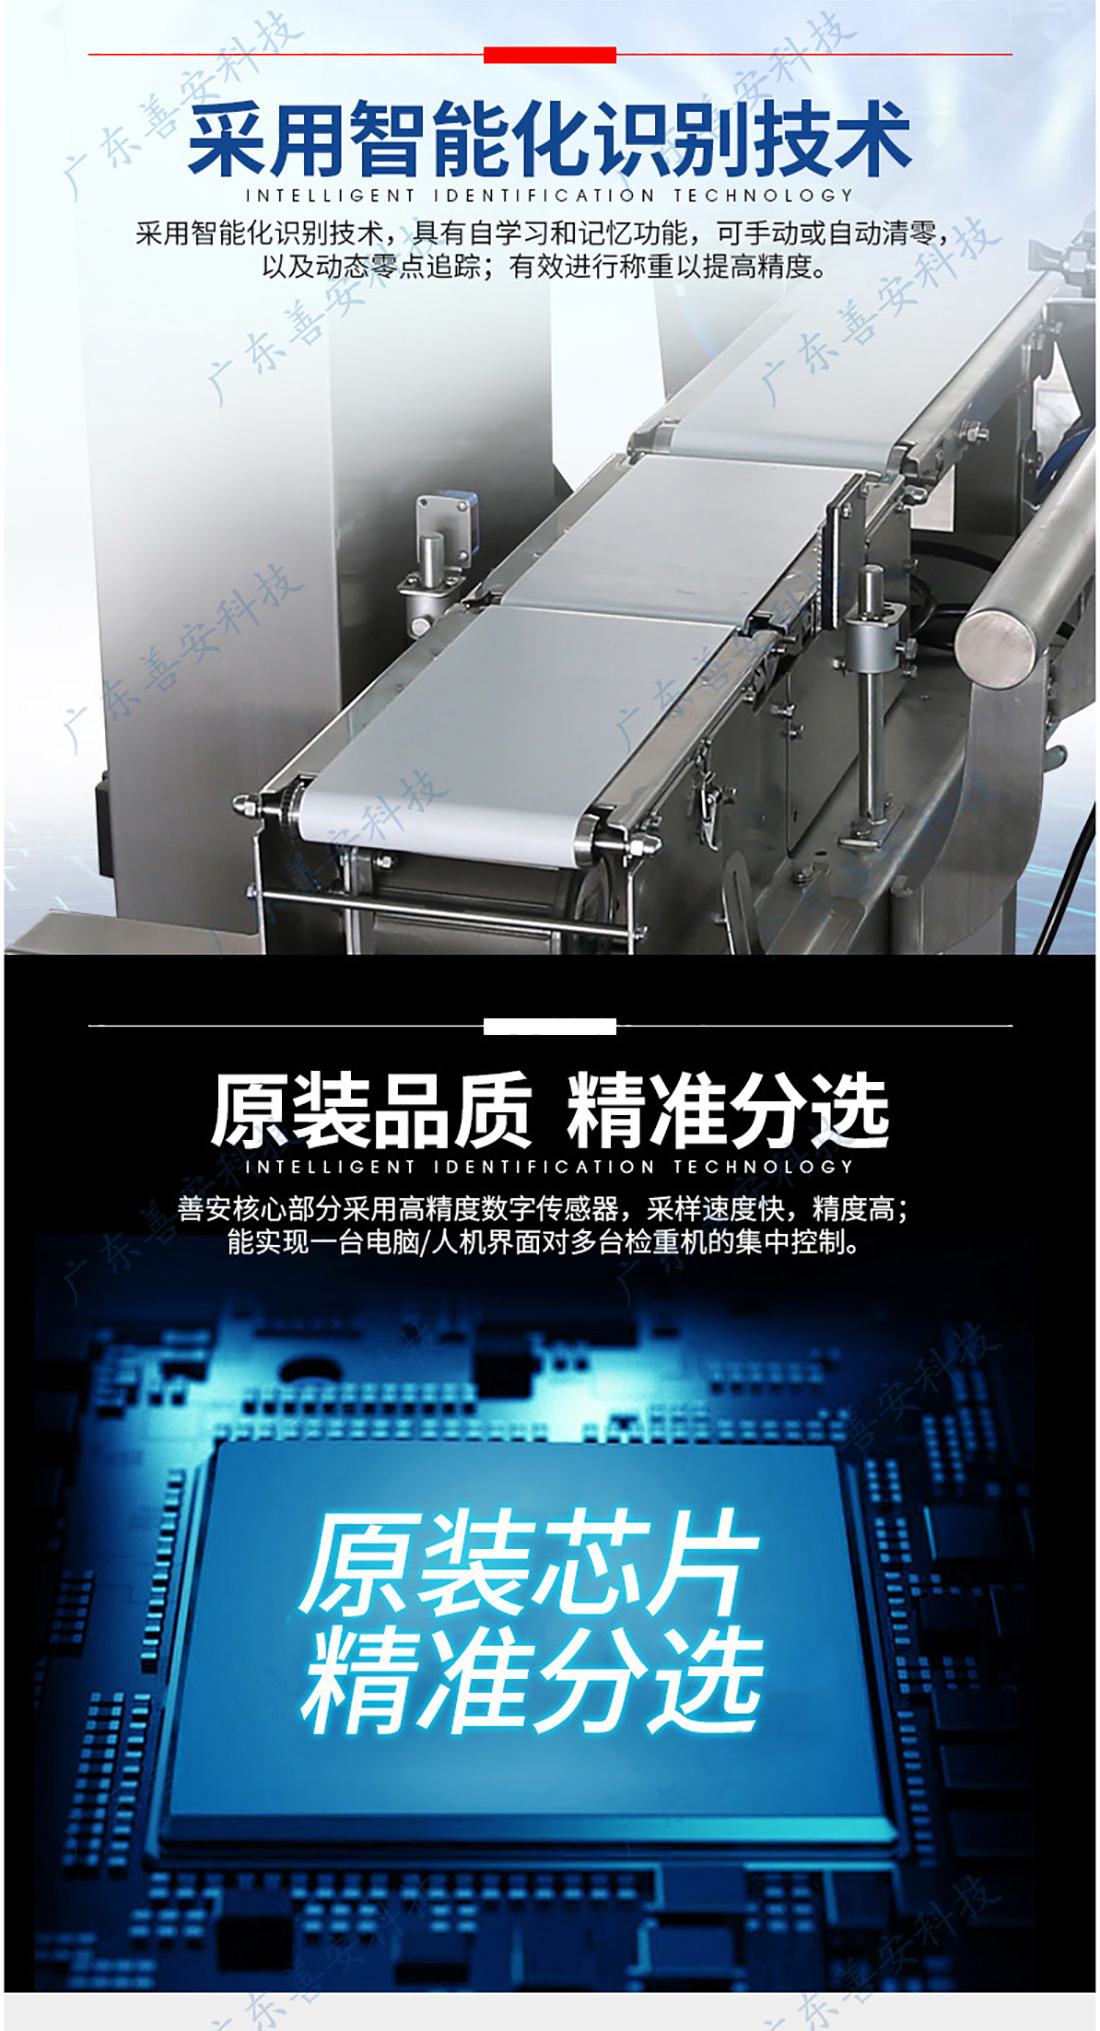 SACW-FXP4021F12多级重量分选秤_05.jpg